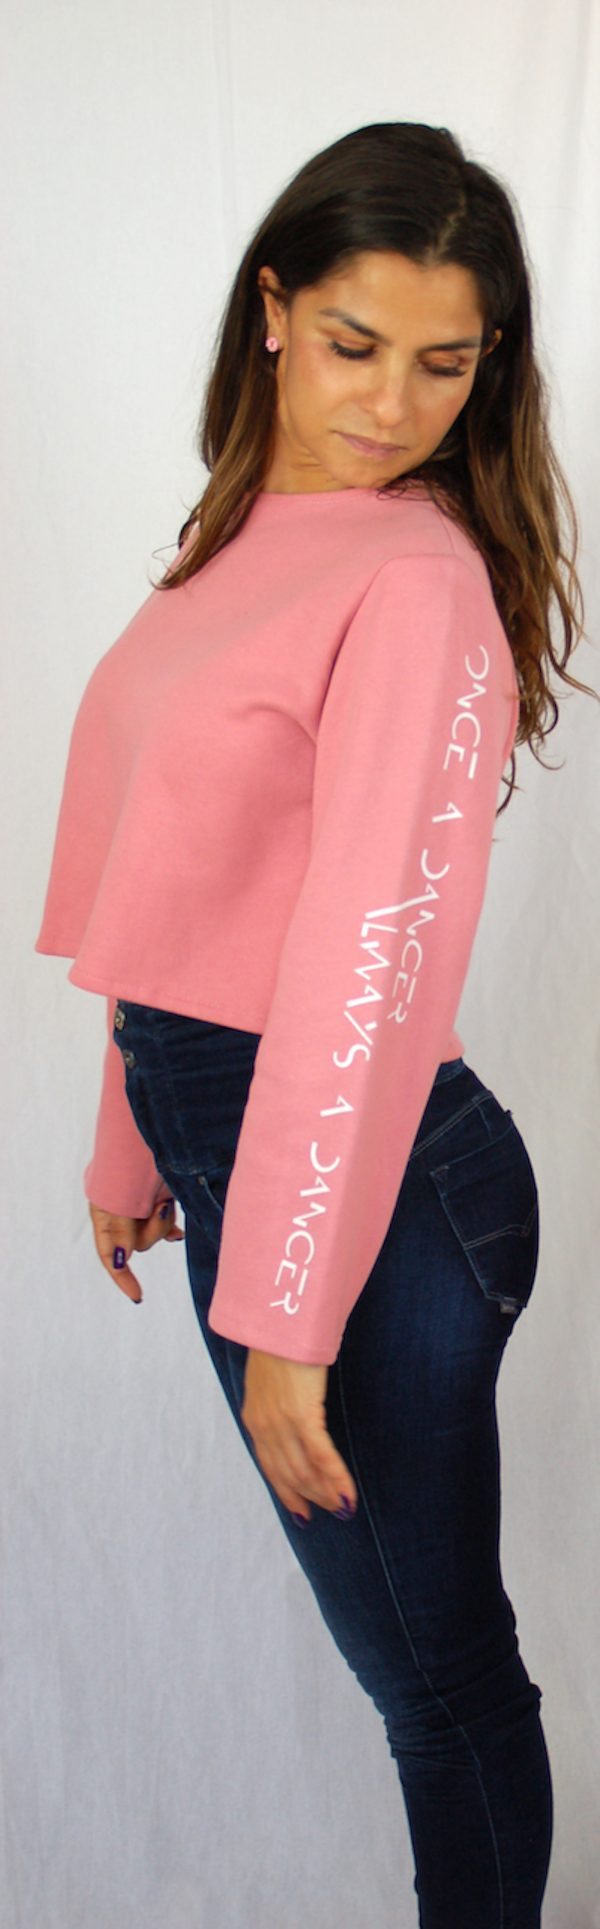 simple sweatshirt sara